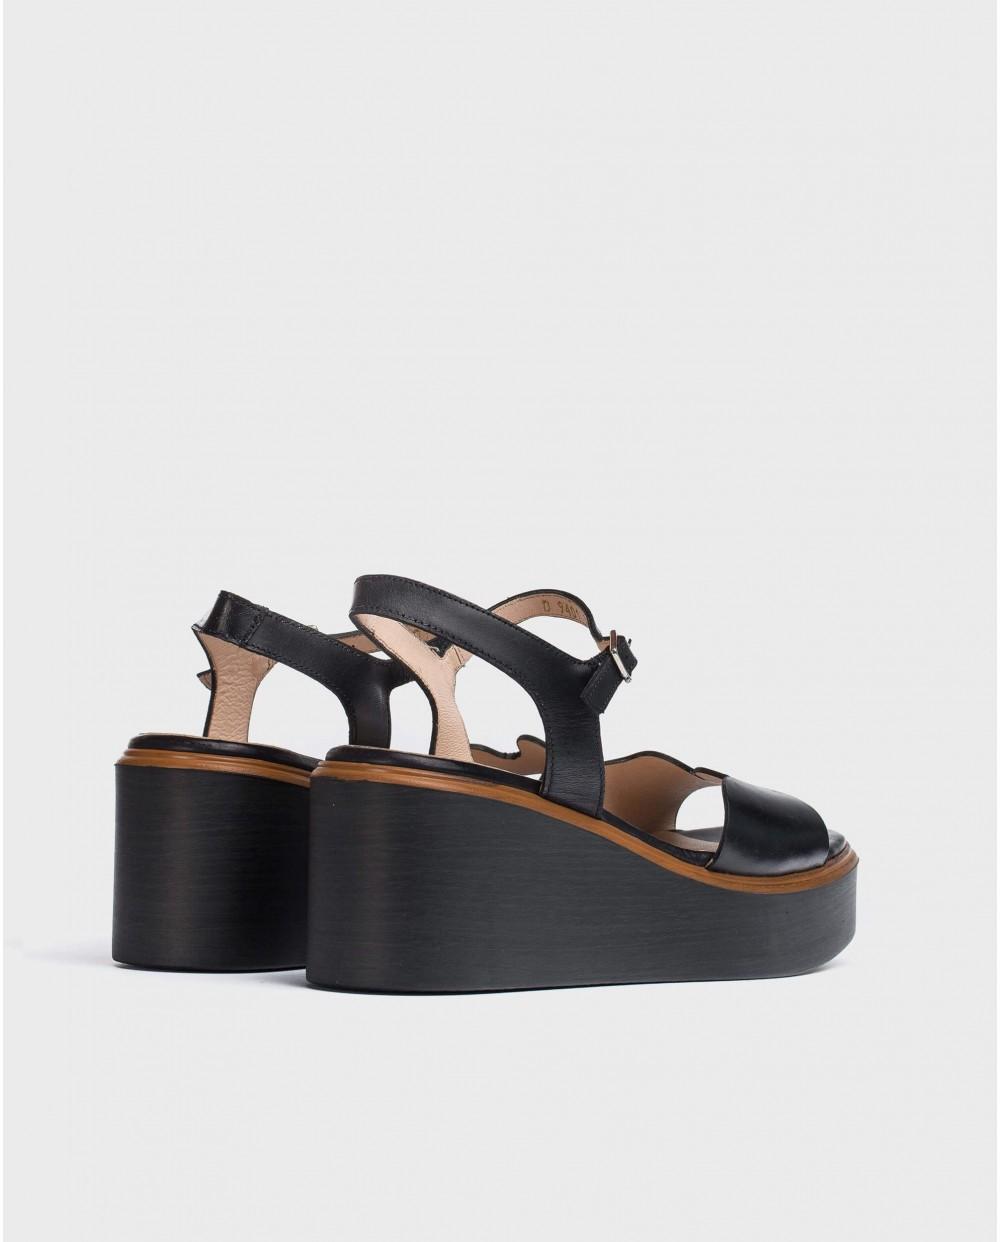 Wonders-Wedges-Wave platform sandal